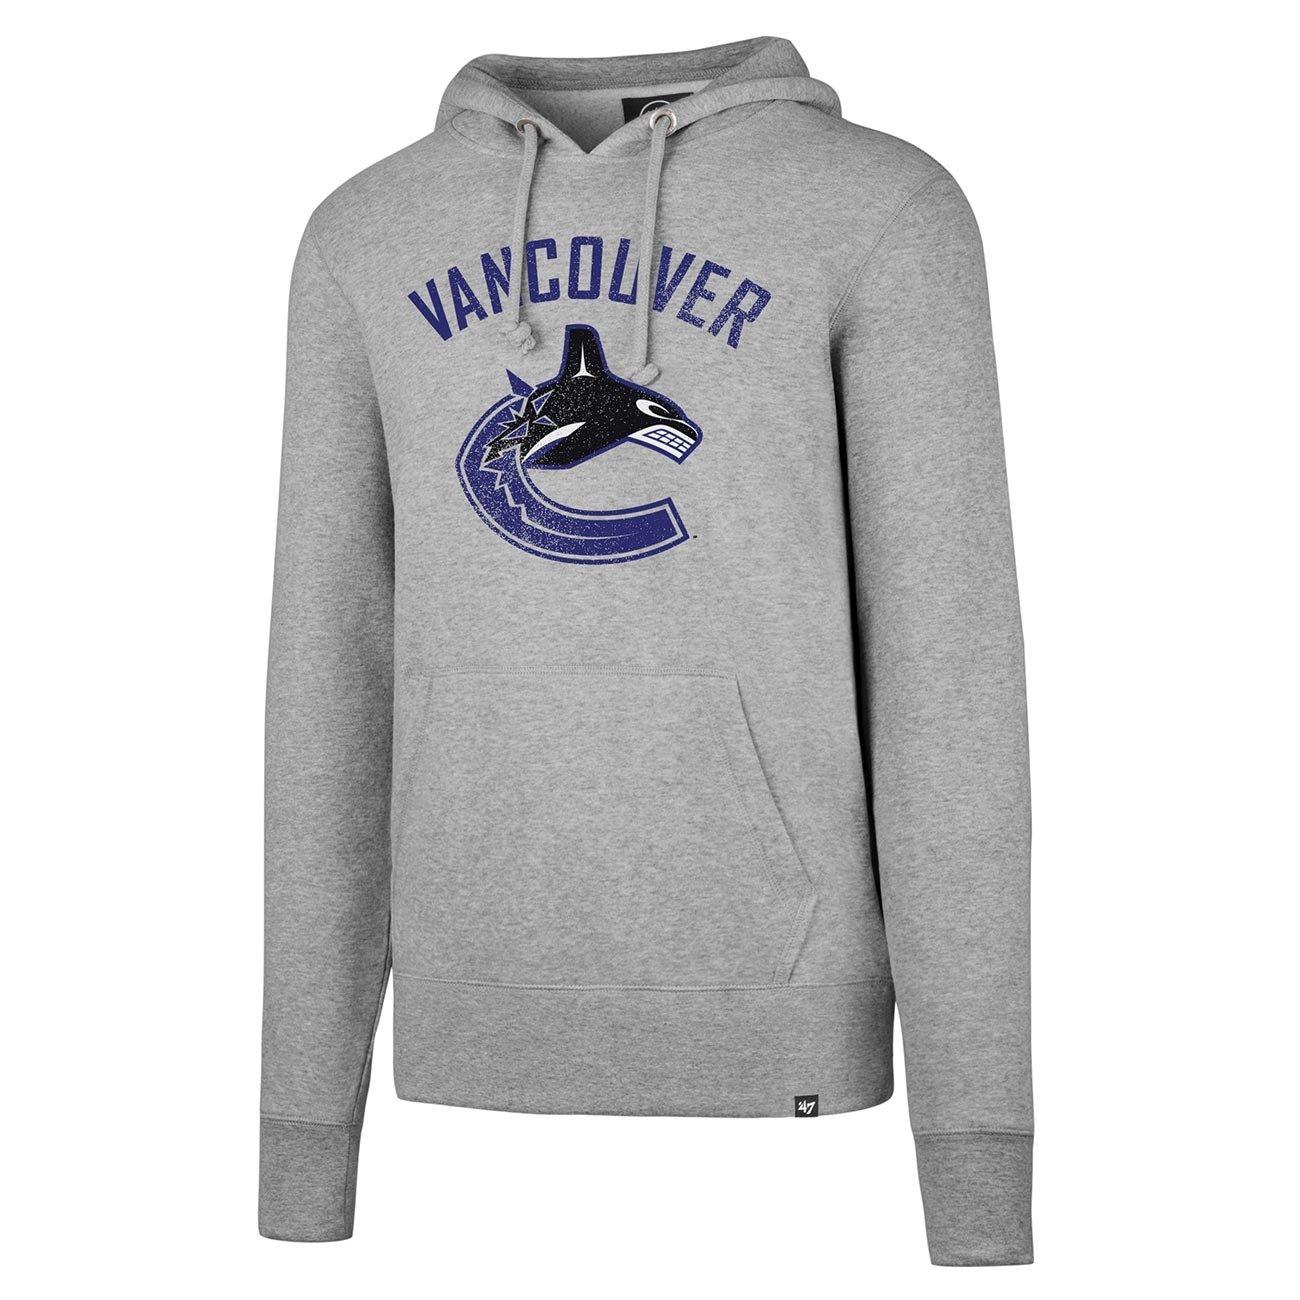 '47 Brand Vancouver Canucks Knockaround Hoodie NHL Sweatshirt Grey